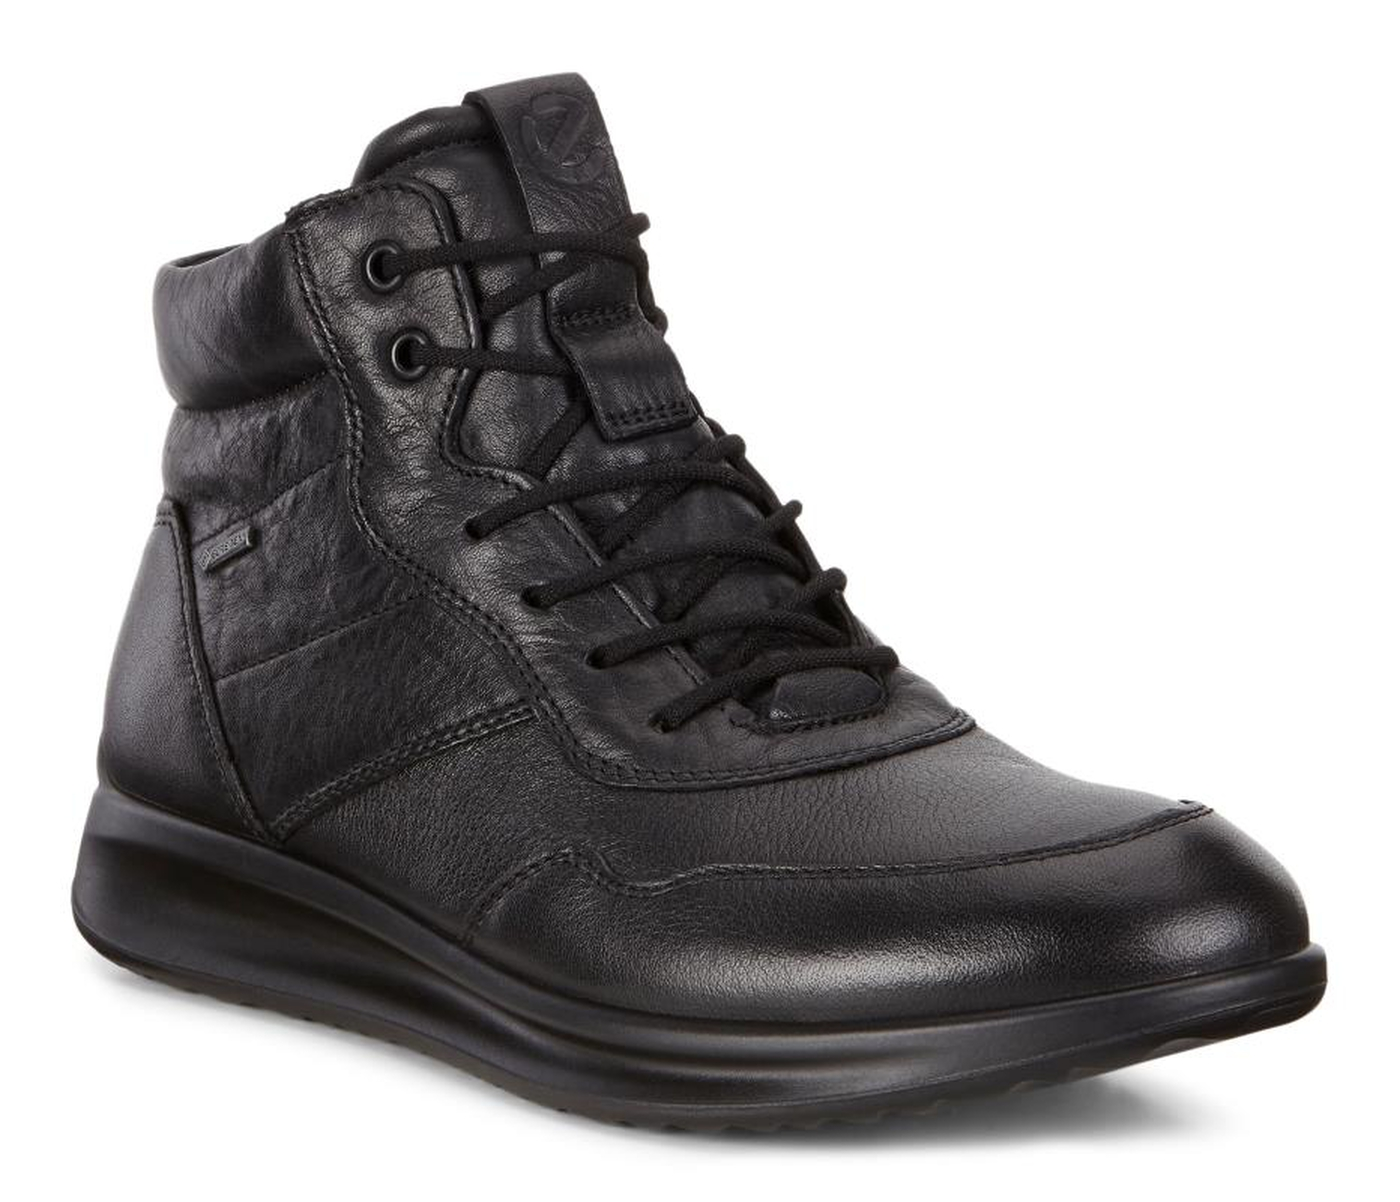 ECCO AQUET Womens GTX Ankle Boot